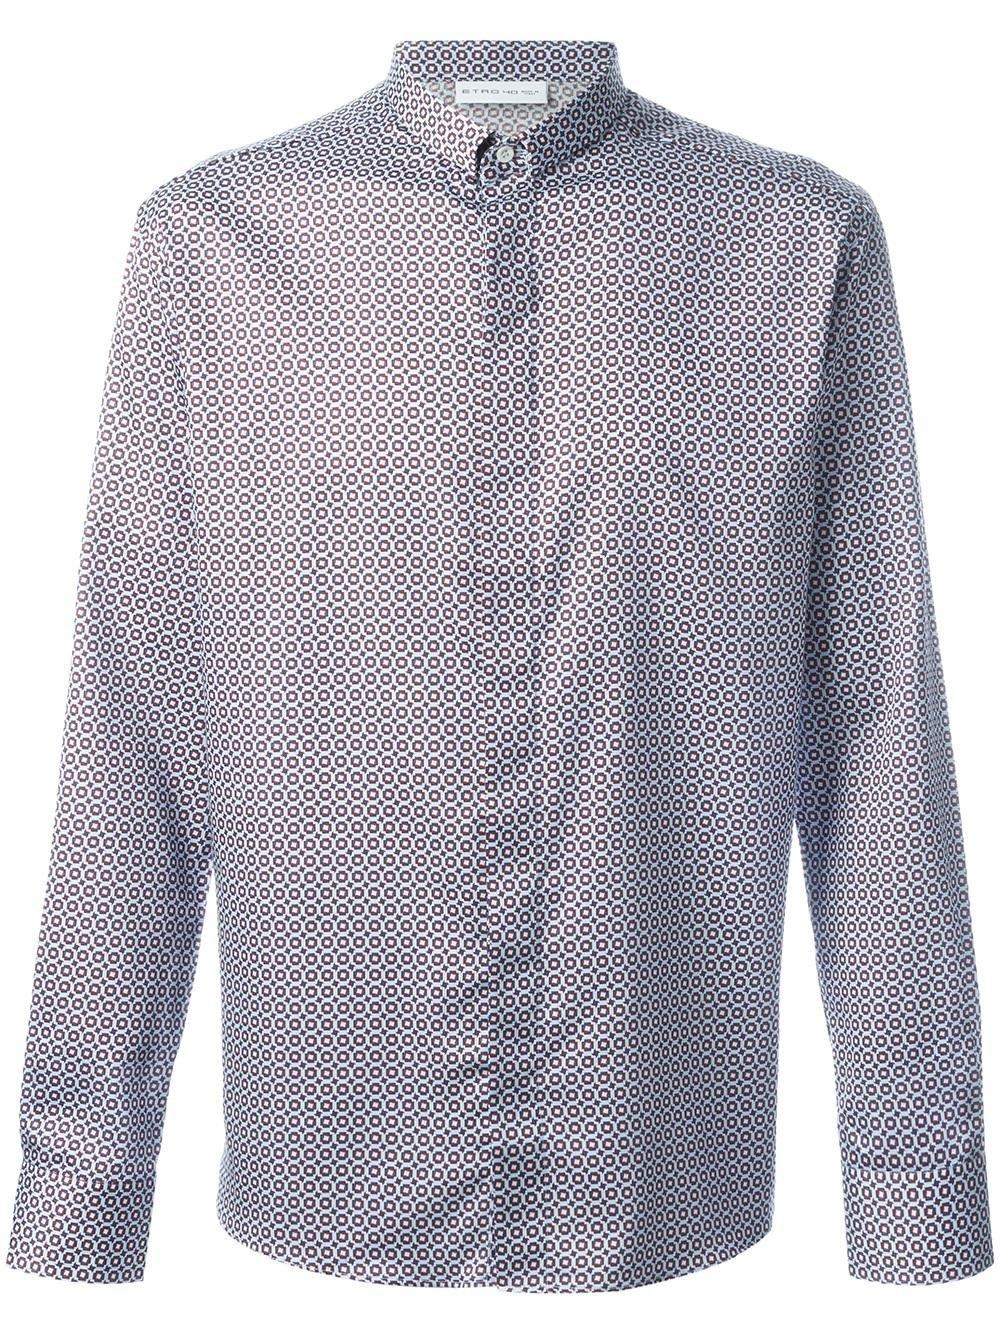 Etro micro print shirt for men lyst for Etro men s shirts